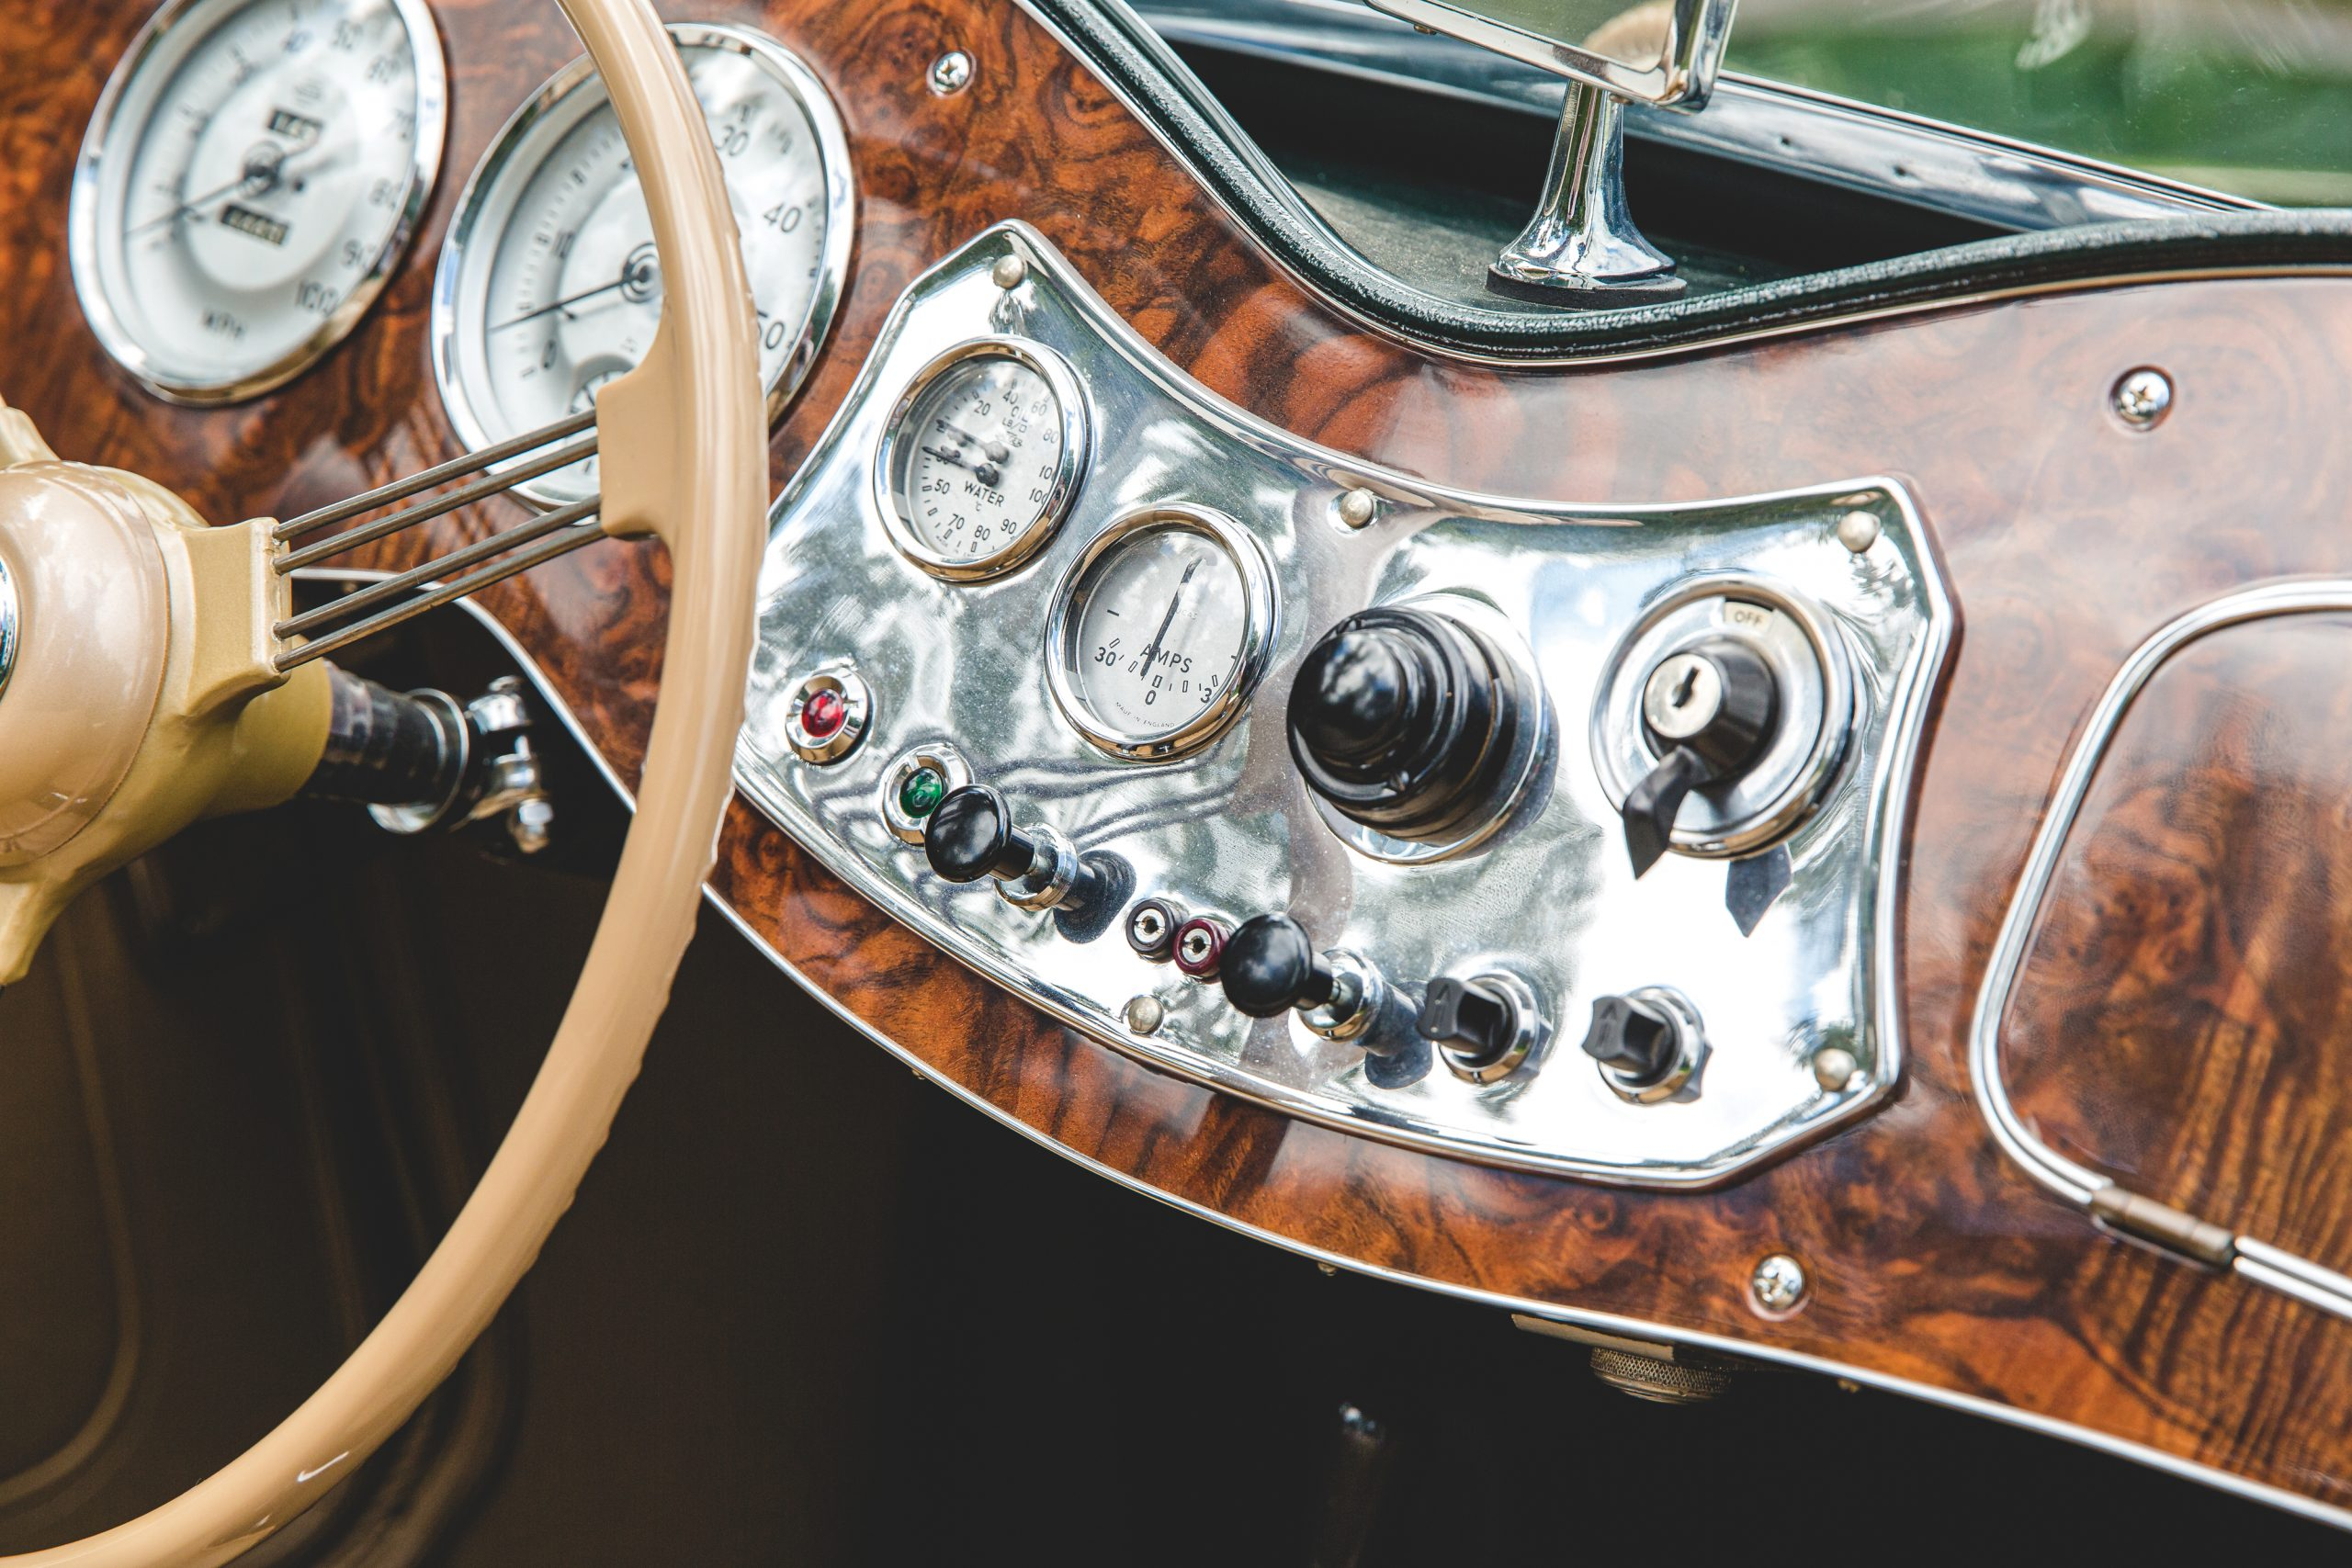 1952 MG TD dash detail